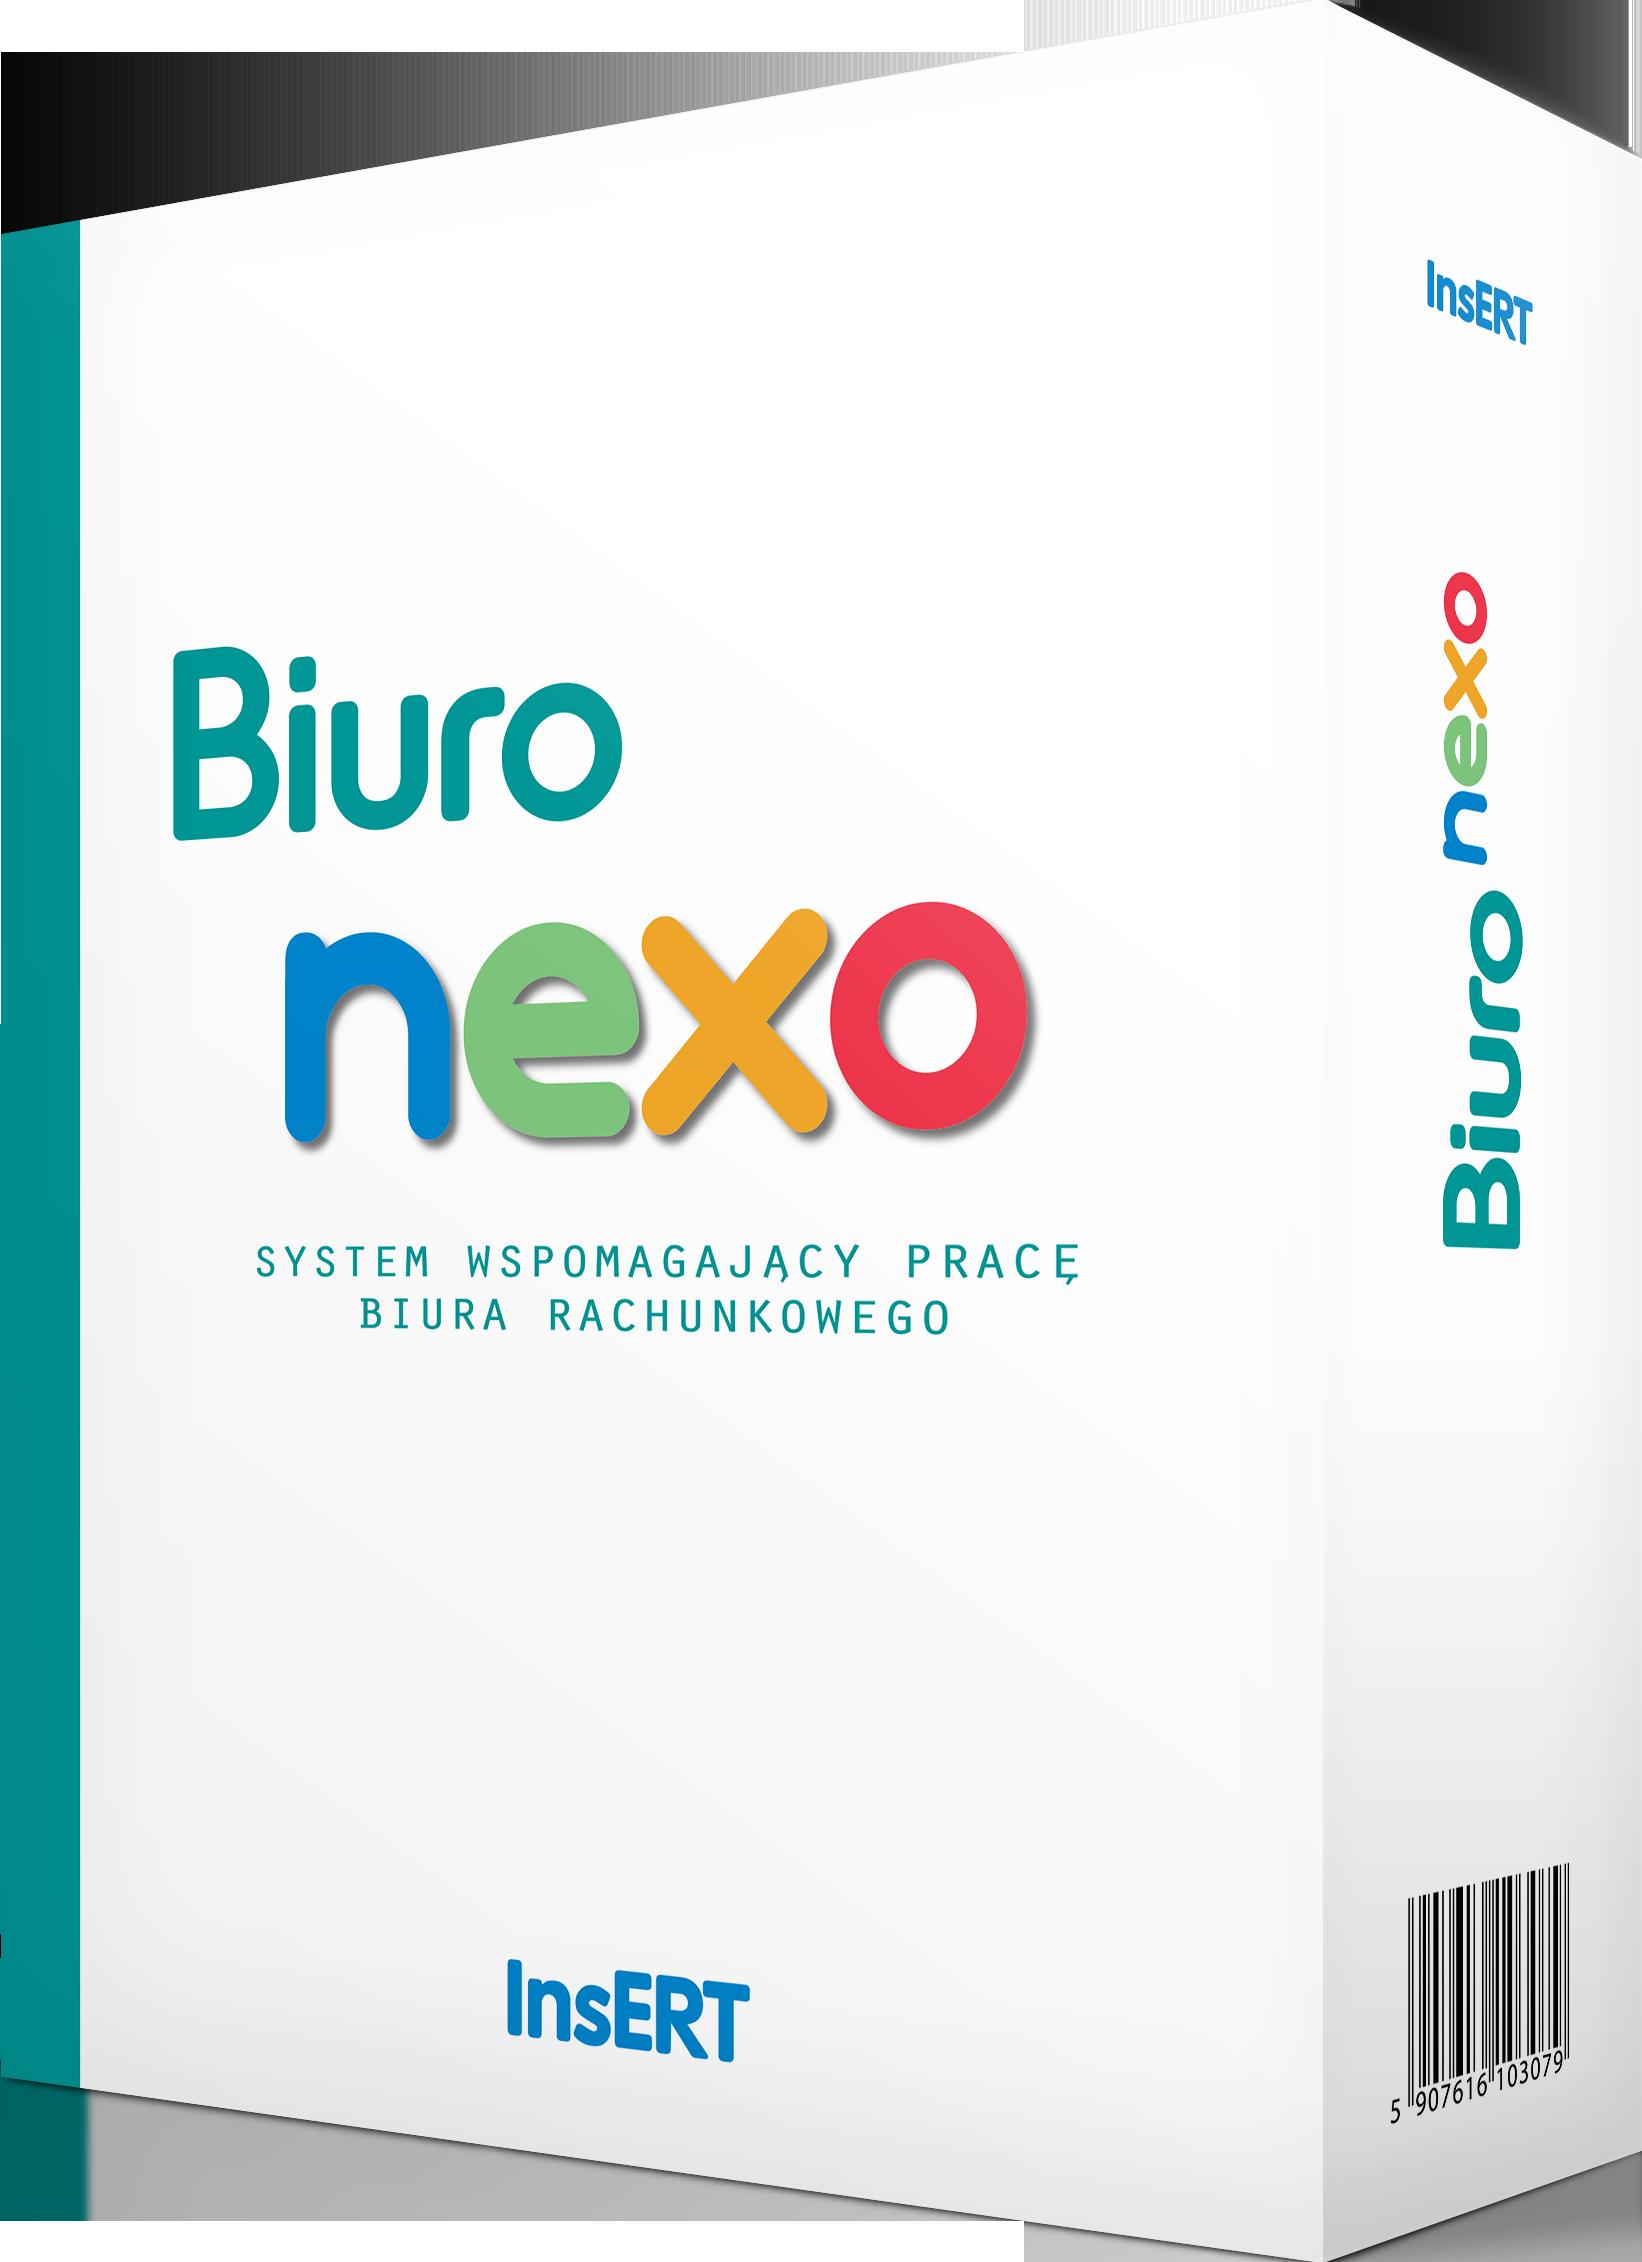 Biuro_nexo_pudelko.png